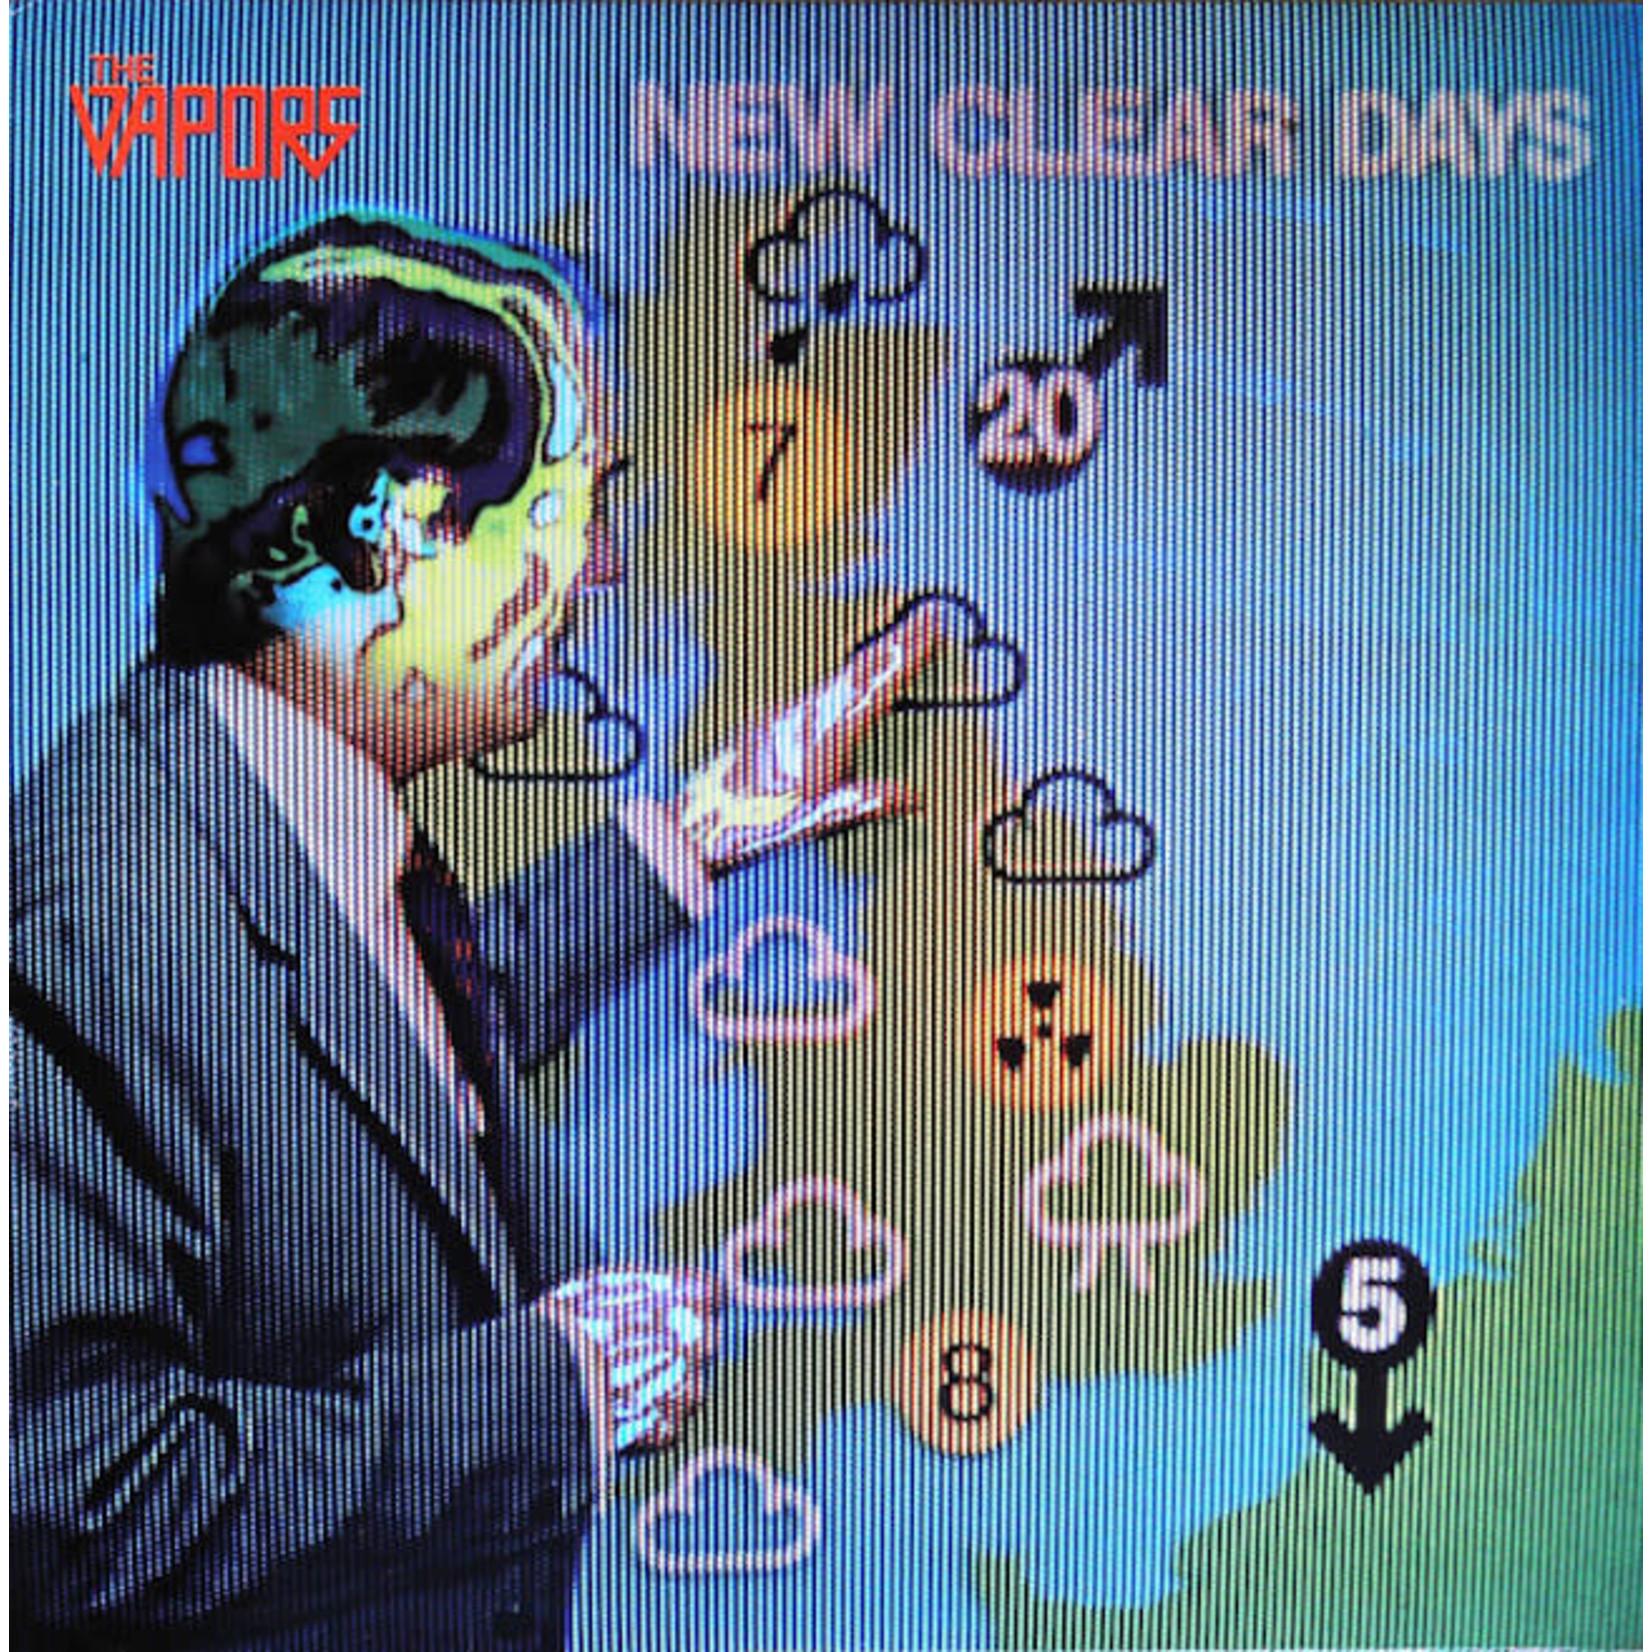 [Vintage] Vapors: New Clear Days